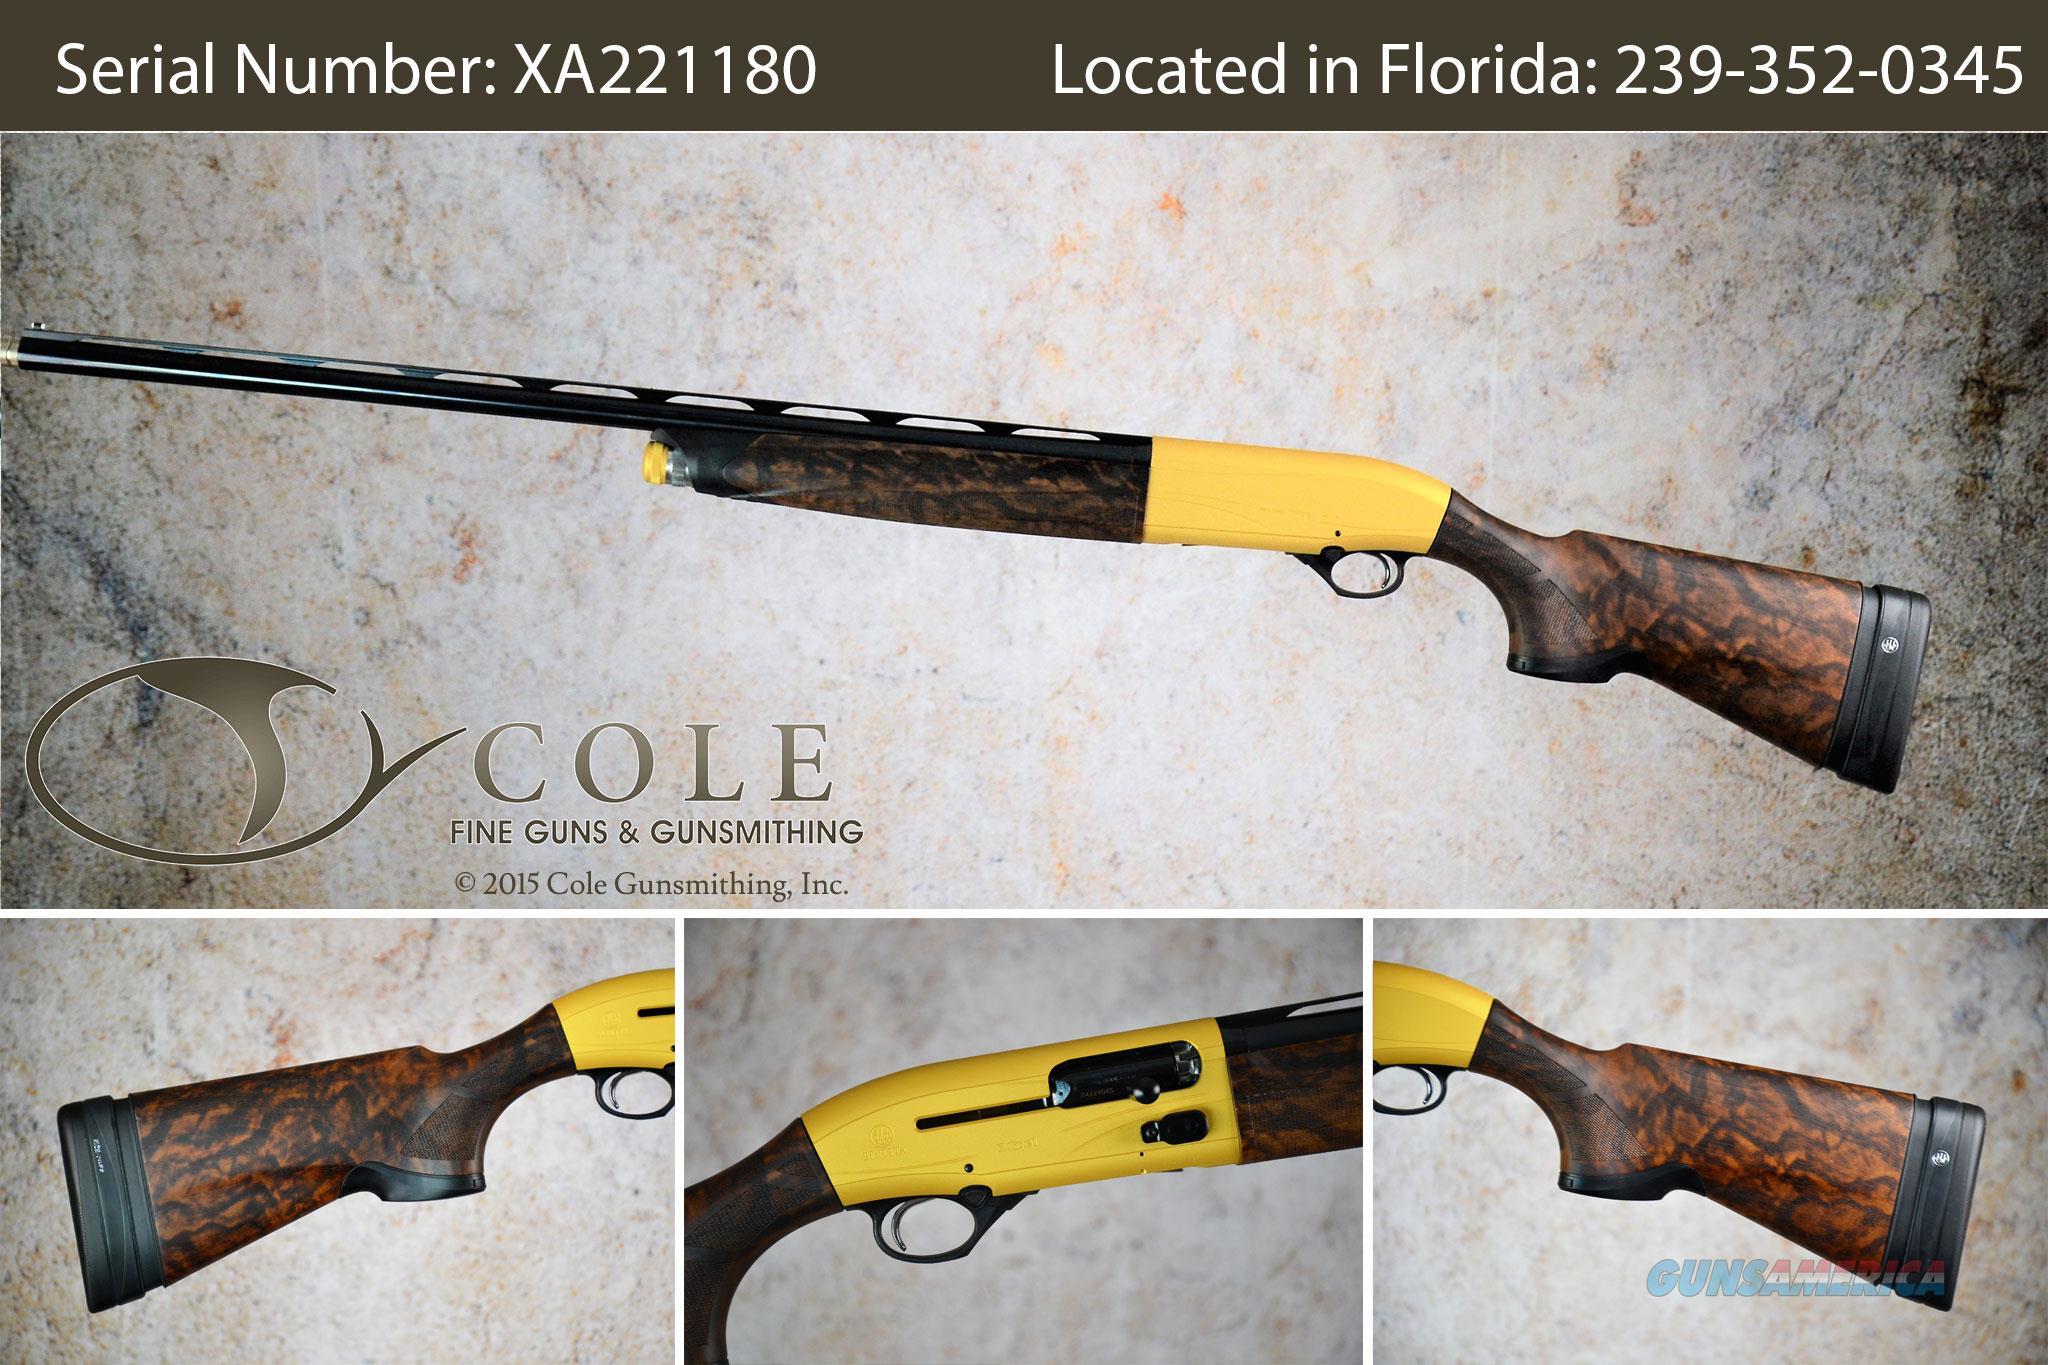 "Beretta A400 Cole Xcel Pro 12g 30"" Sporting with Kick Off SN:#XA221180  Guns > Shotguns > Beretta Shotguns > O/U > Trap/Skeet"